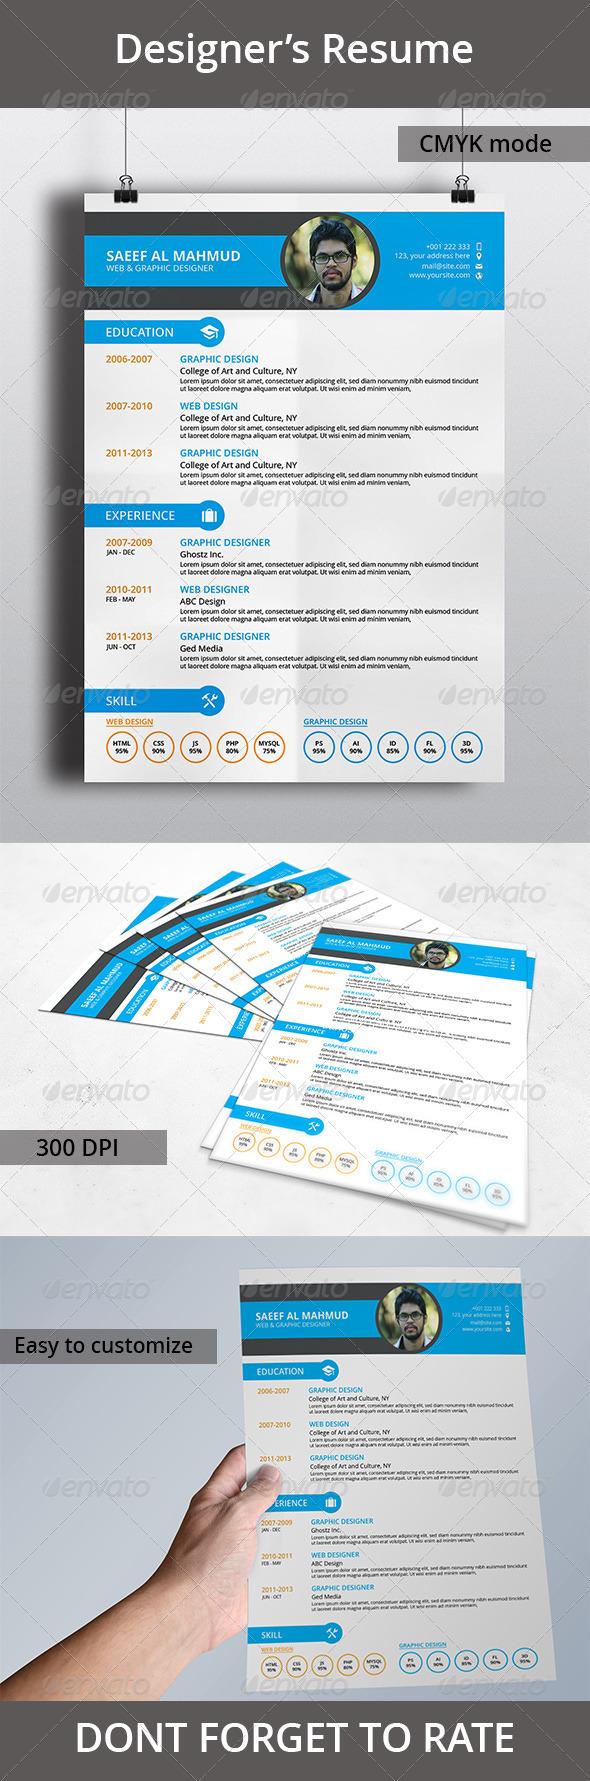 GraphicRiver Designer s Resume 7058266